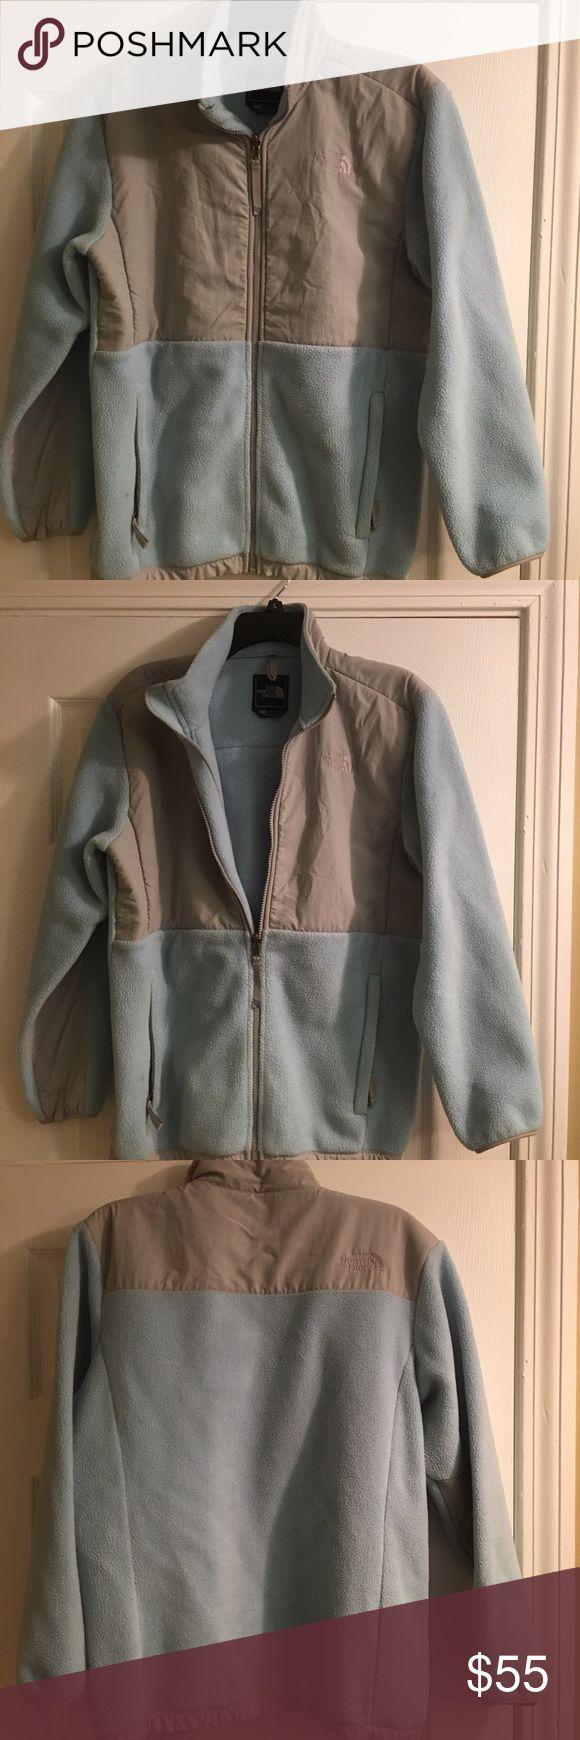 North Face, Girls Fleece Fleece gray & blue xl girls fleece, pre owned in very good condition North Face Jackets & Coats Blazers